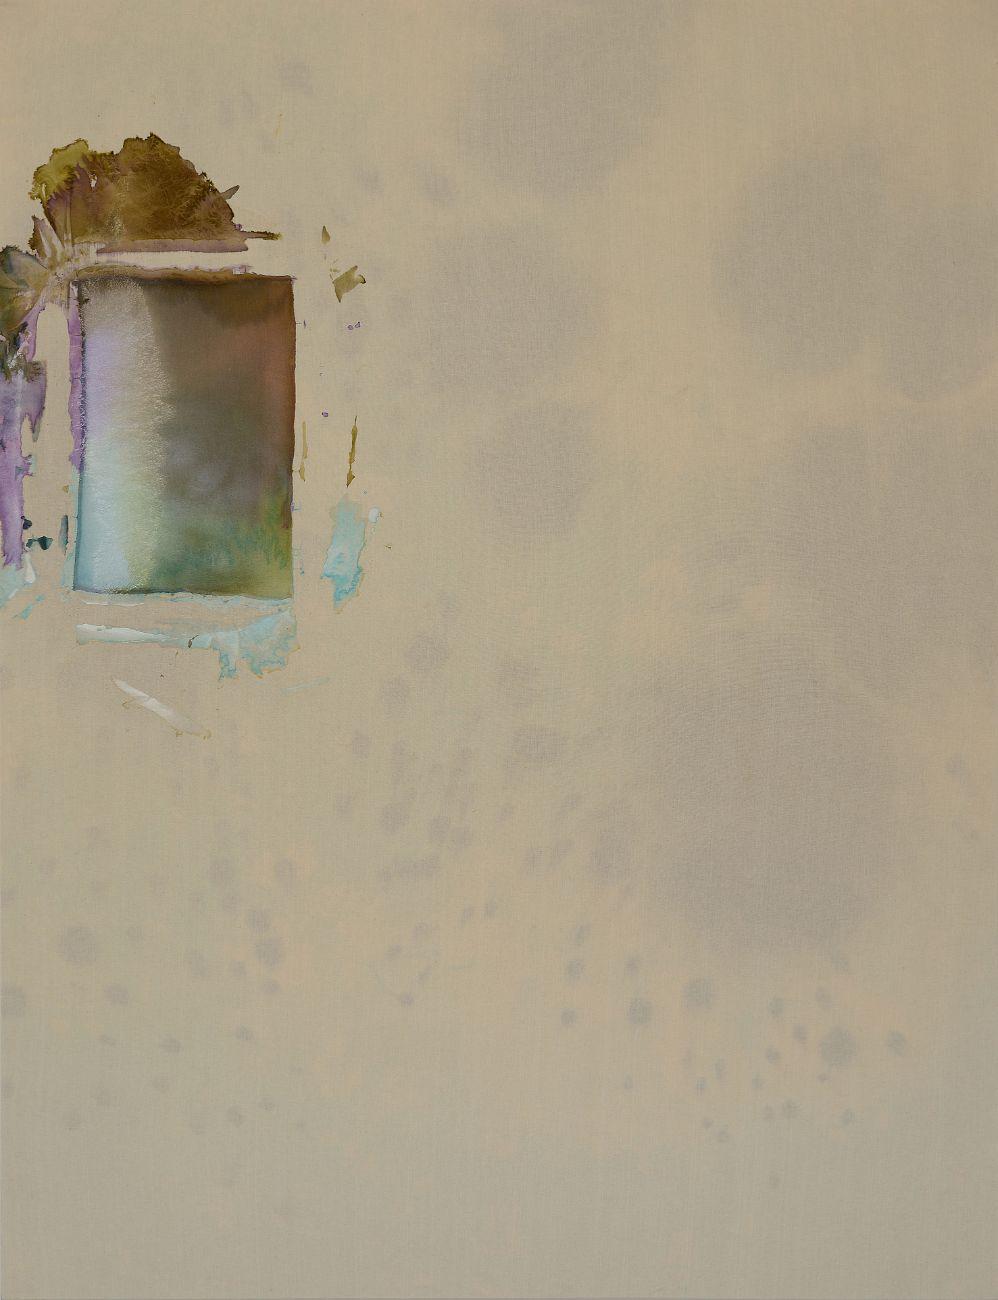 Ice coat, 145x190cm, mixed media on canvas, 2016